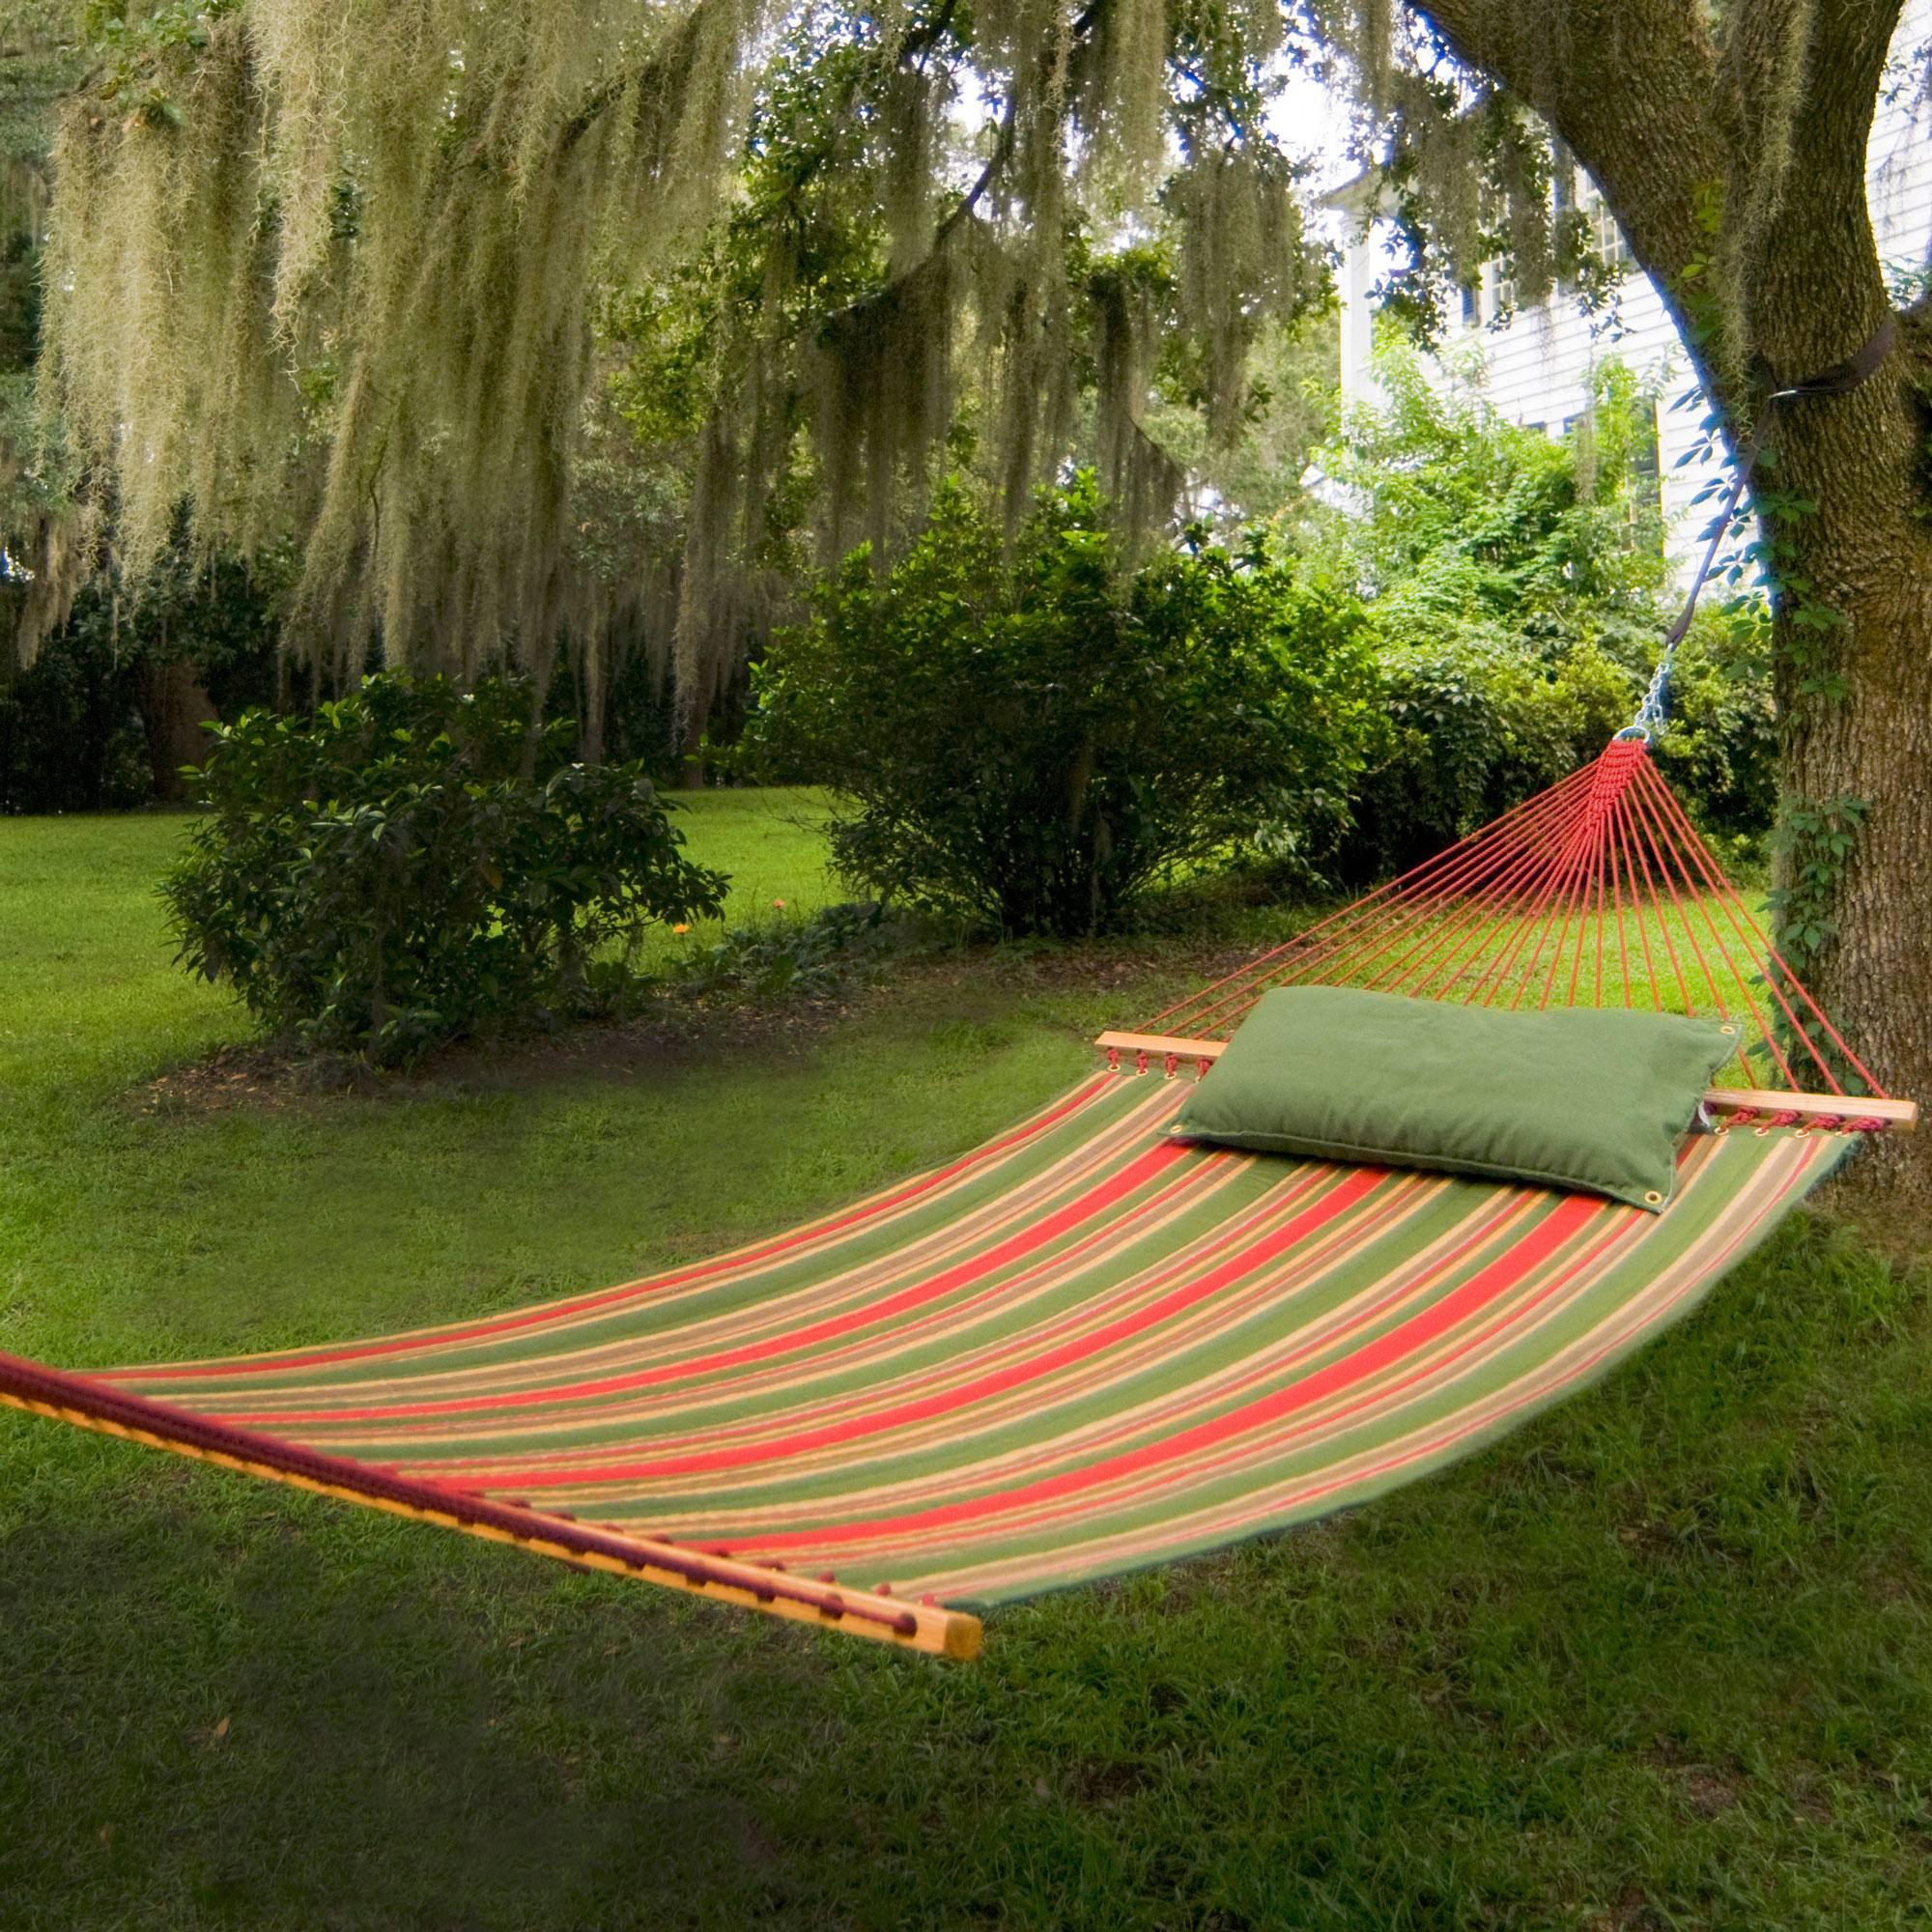 Trellis Garden Large Quilted Fabric Hammock